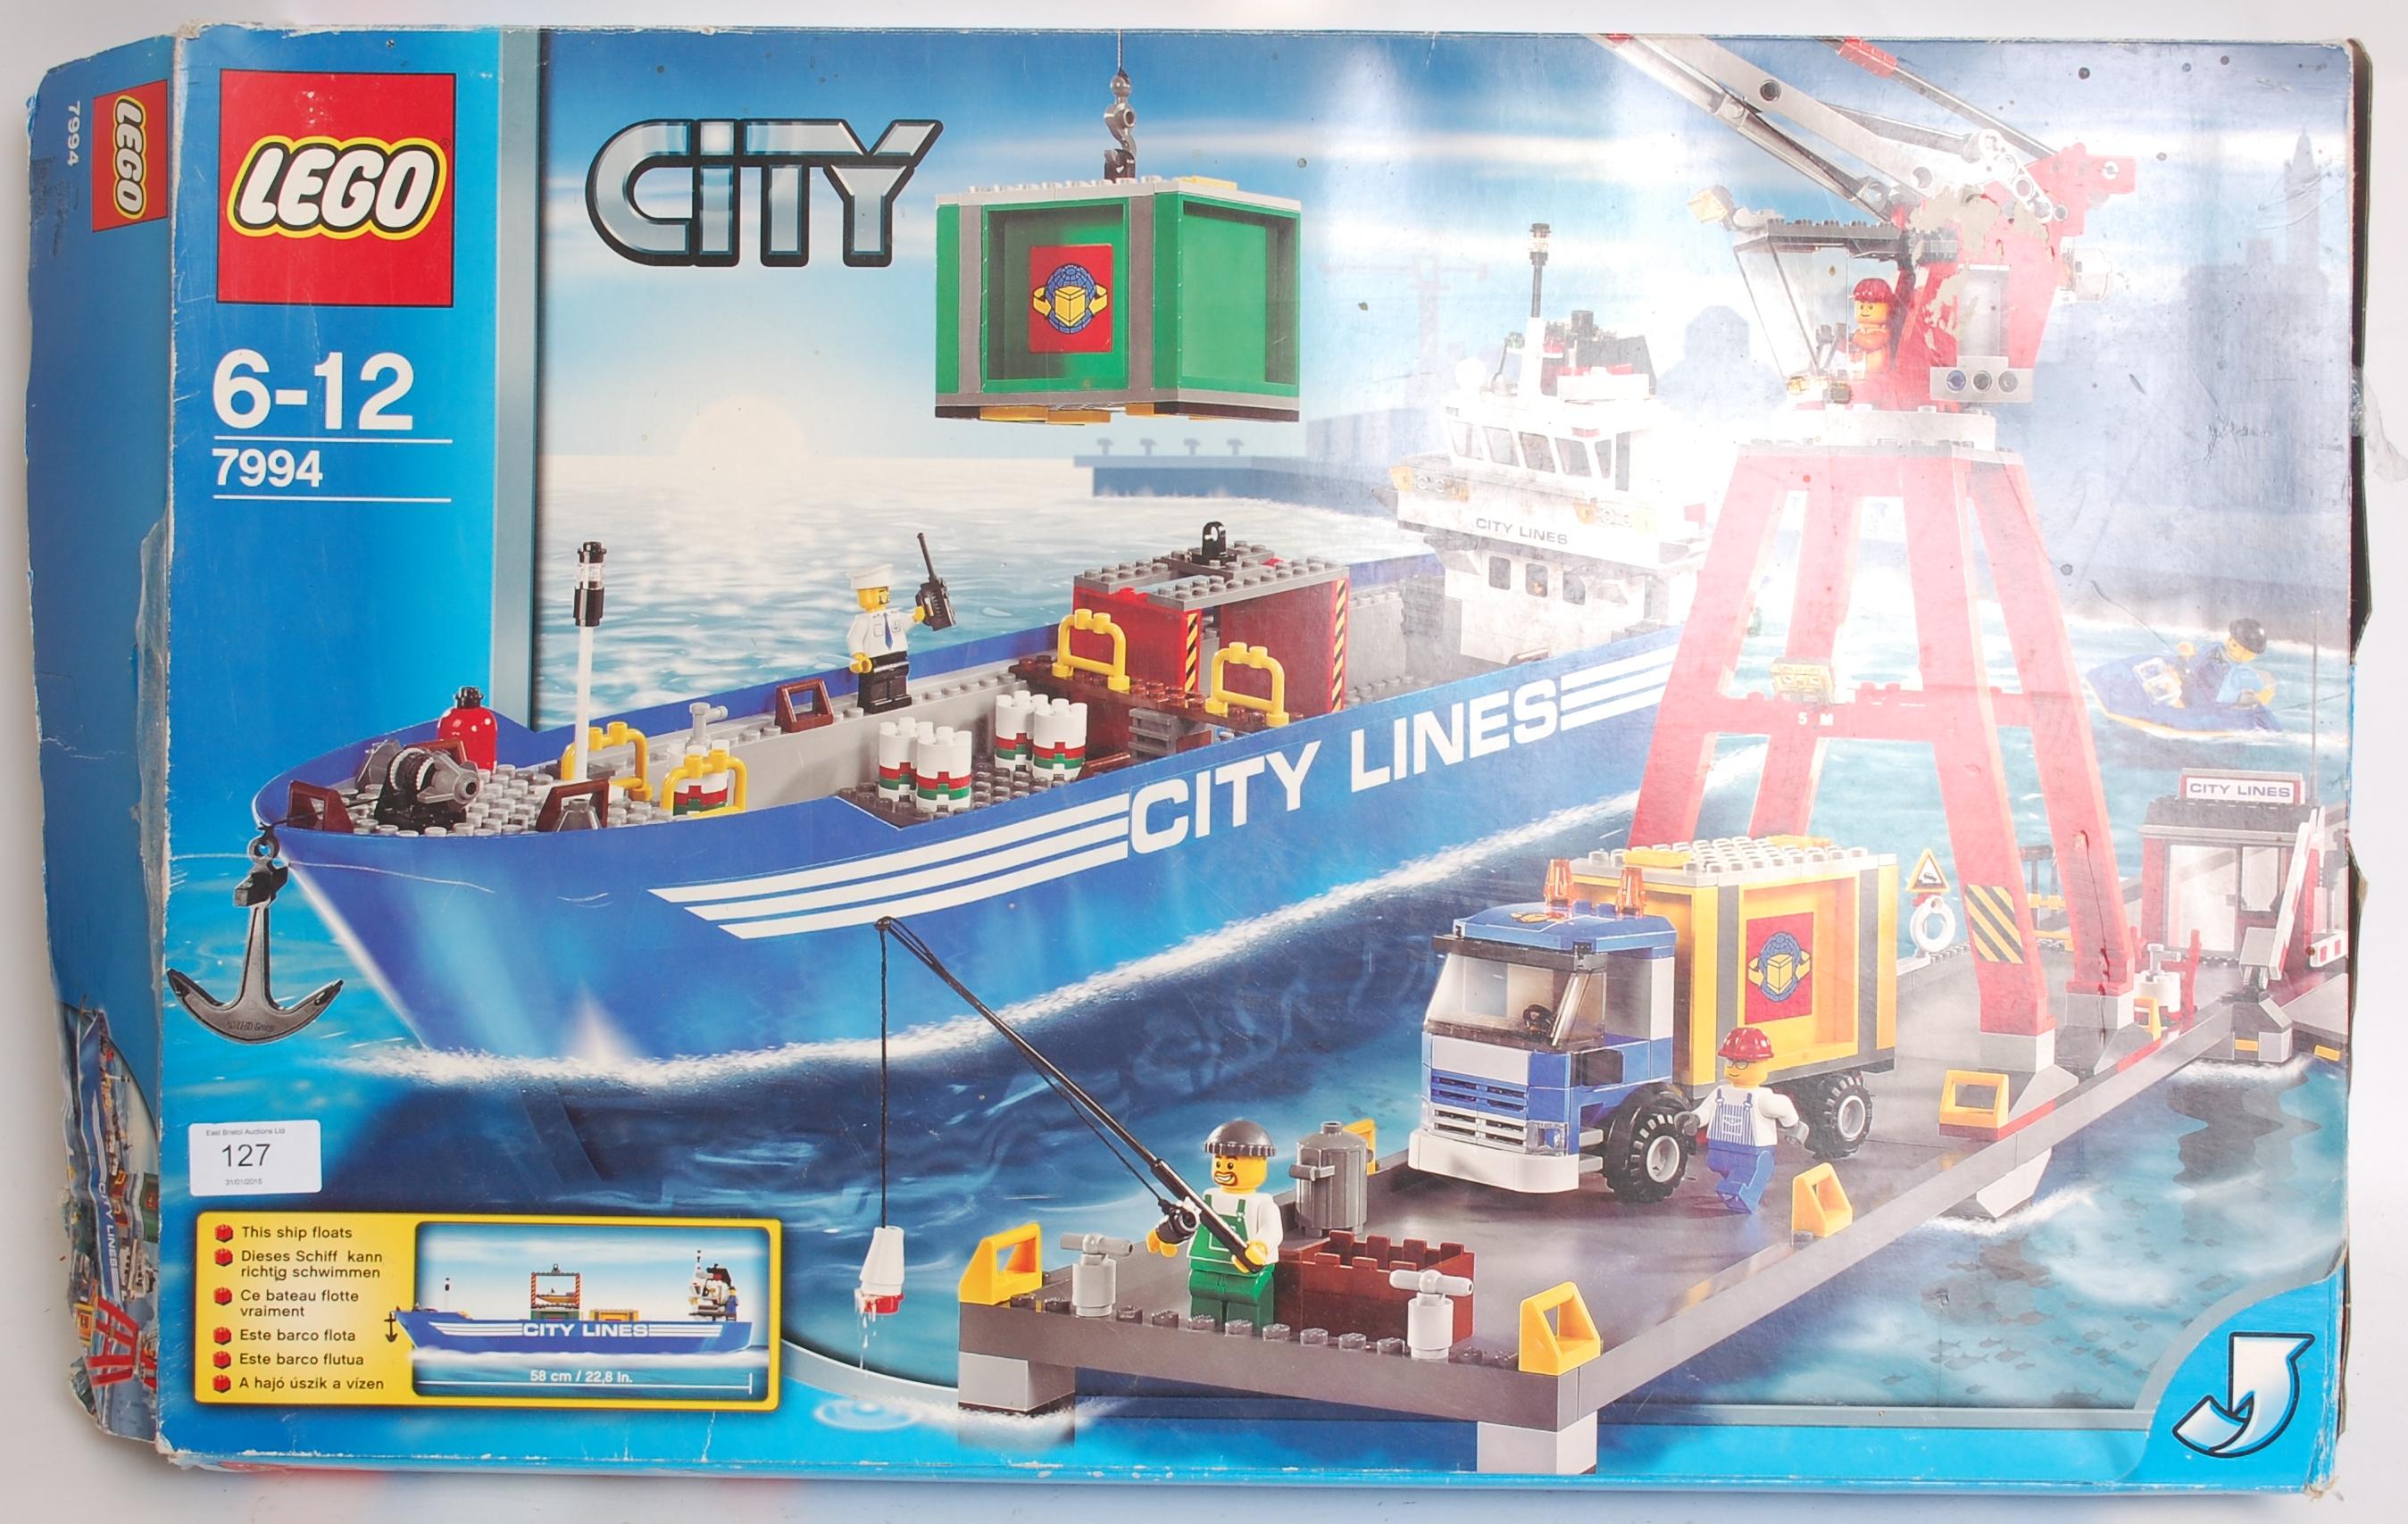 lot 127 lego an original vintage lego city 7994 - Lego City Bateau